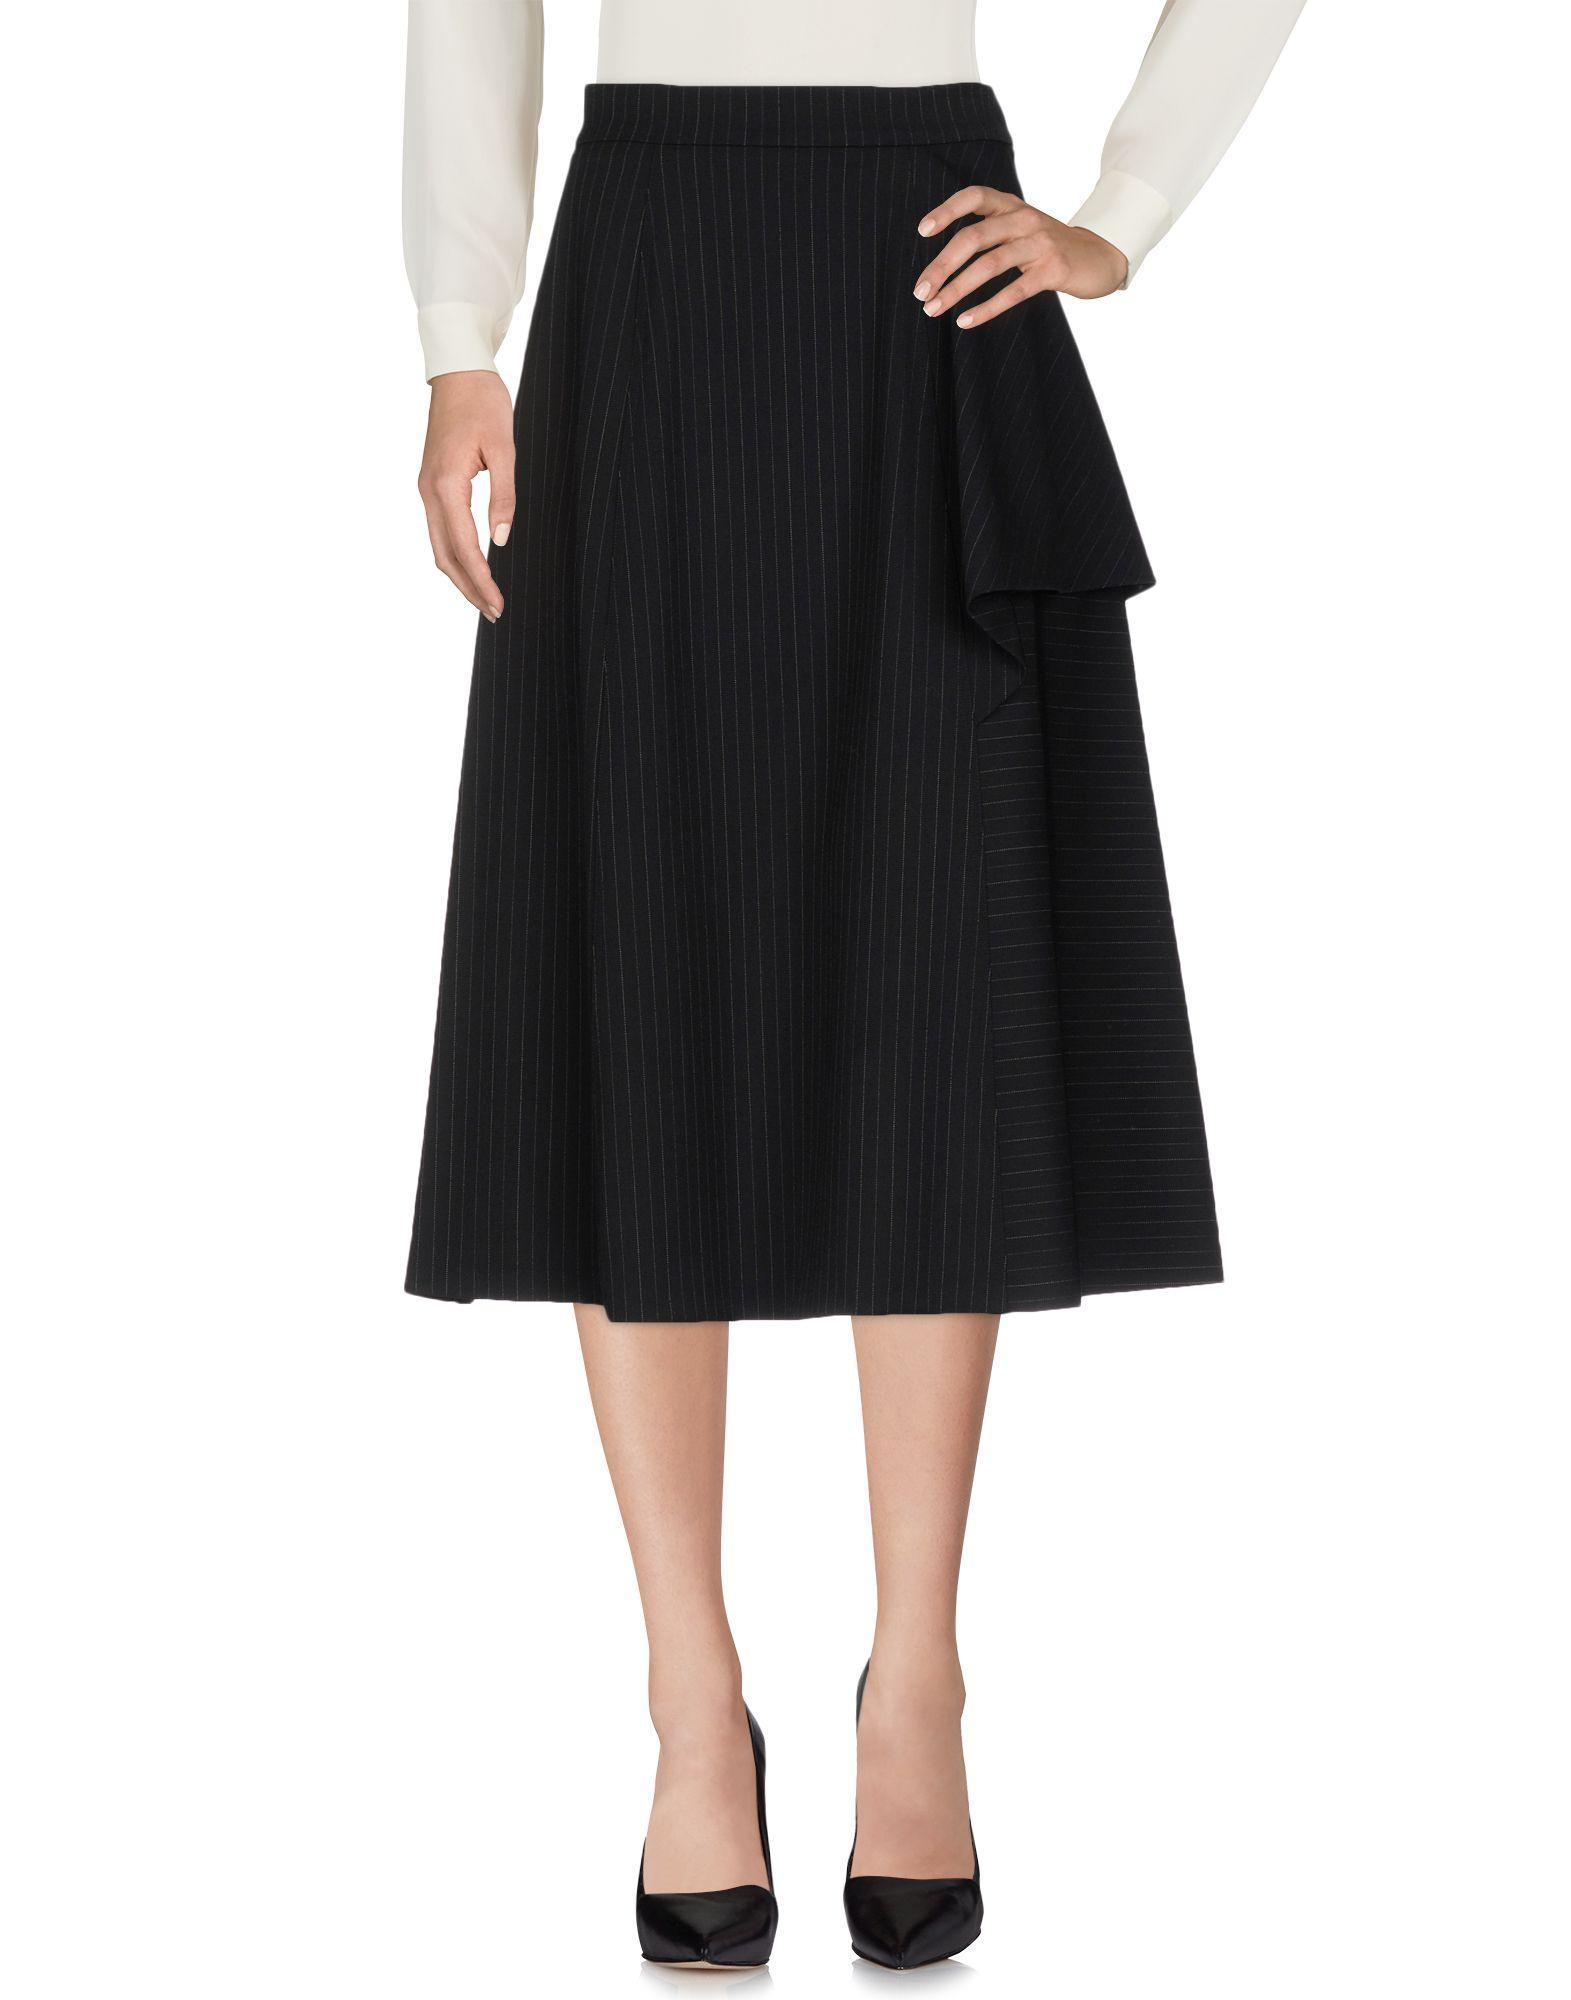 Antonio Marras Midi Skirts In Black